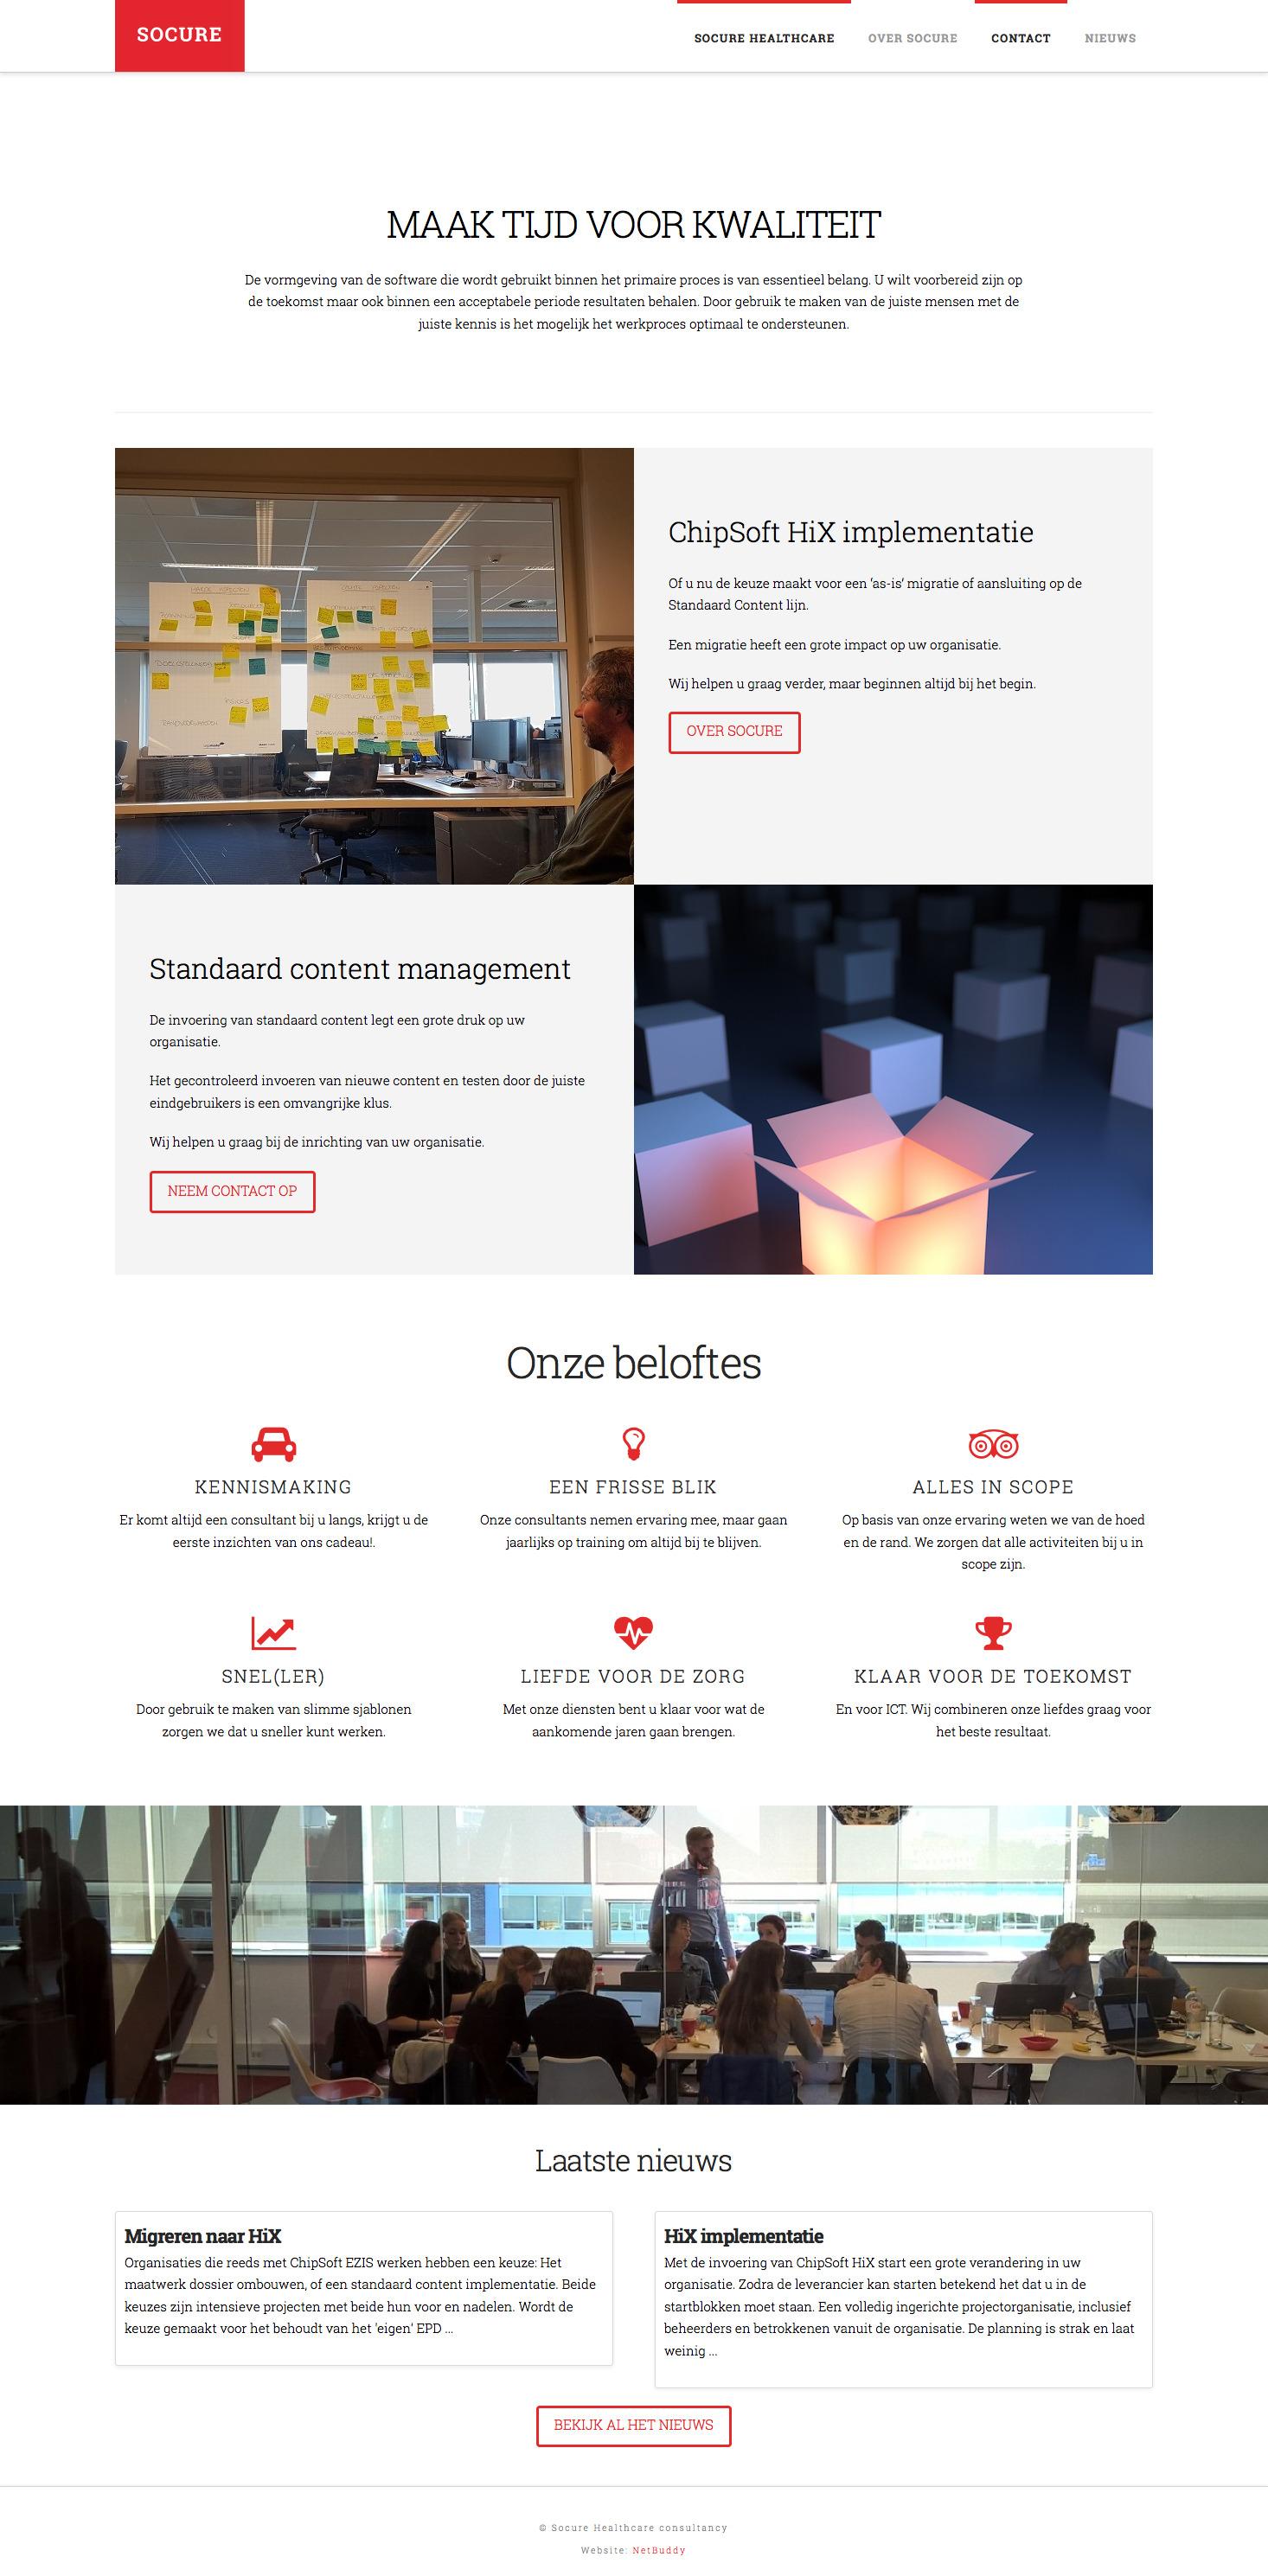 fireshot-capture-43-chipsoft-hix-implementatie-socure-healthcare-consul_-http___www-socure-nl_